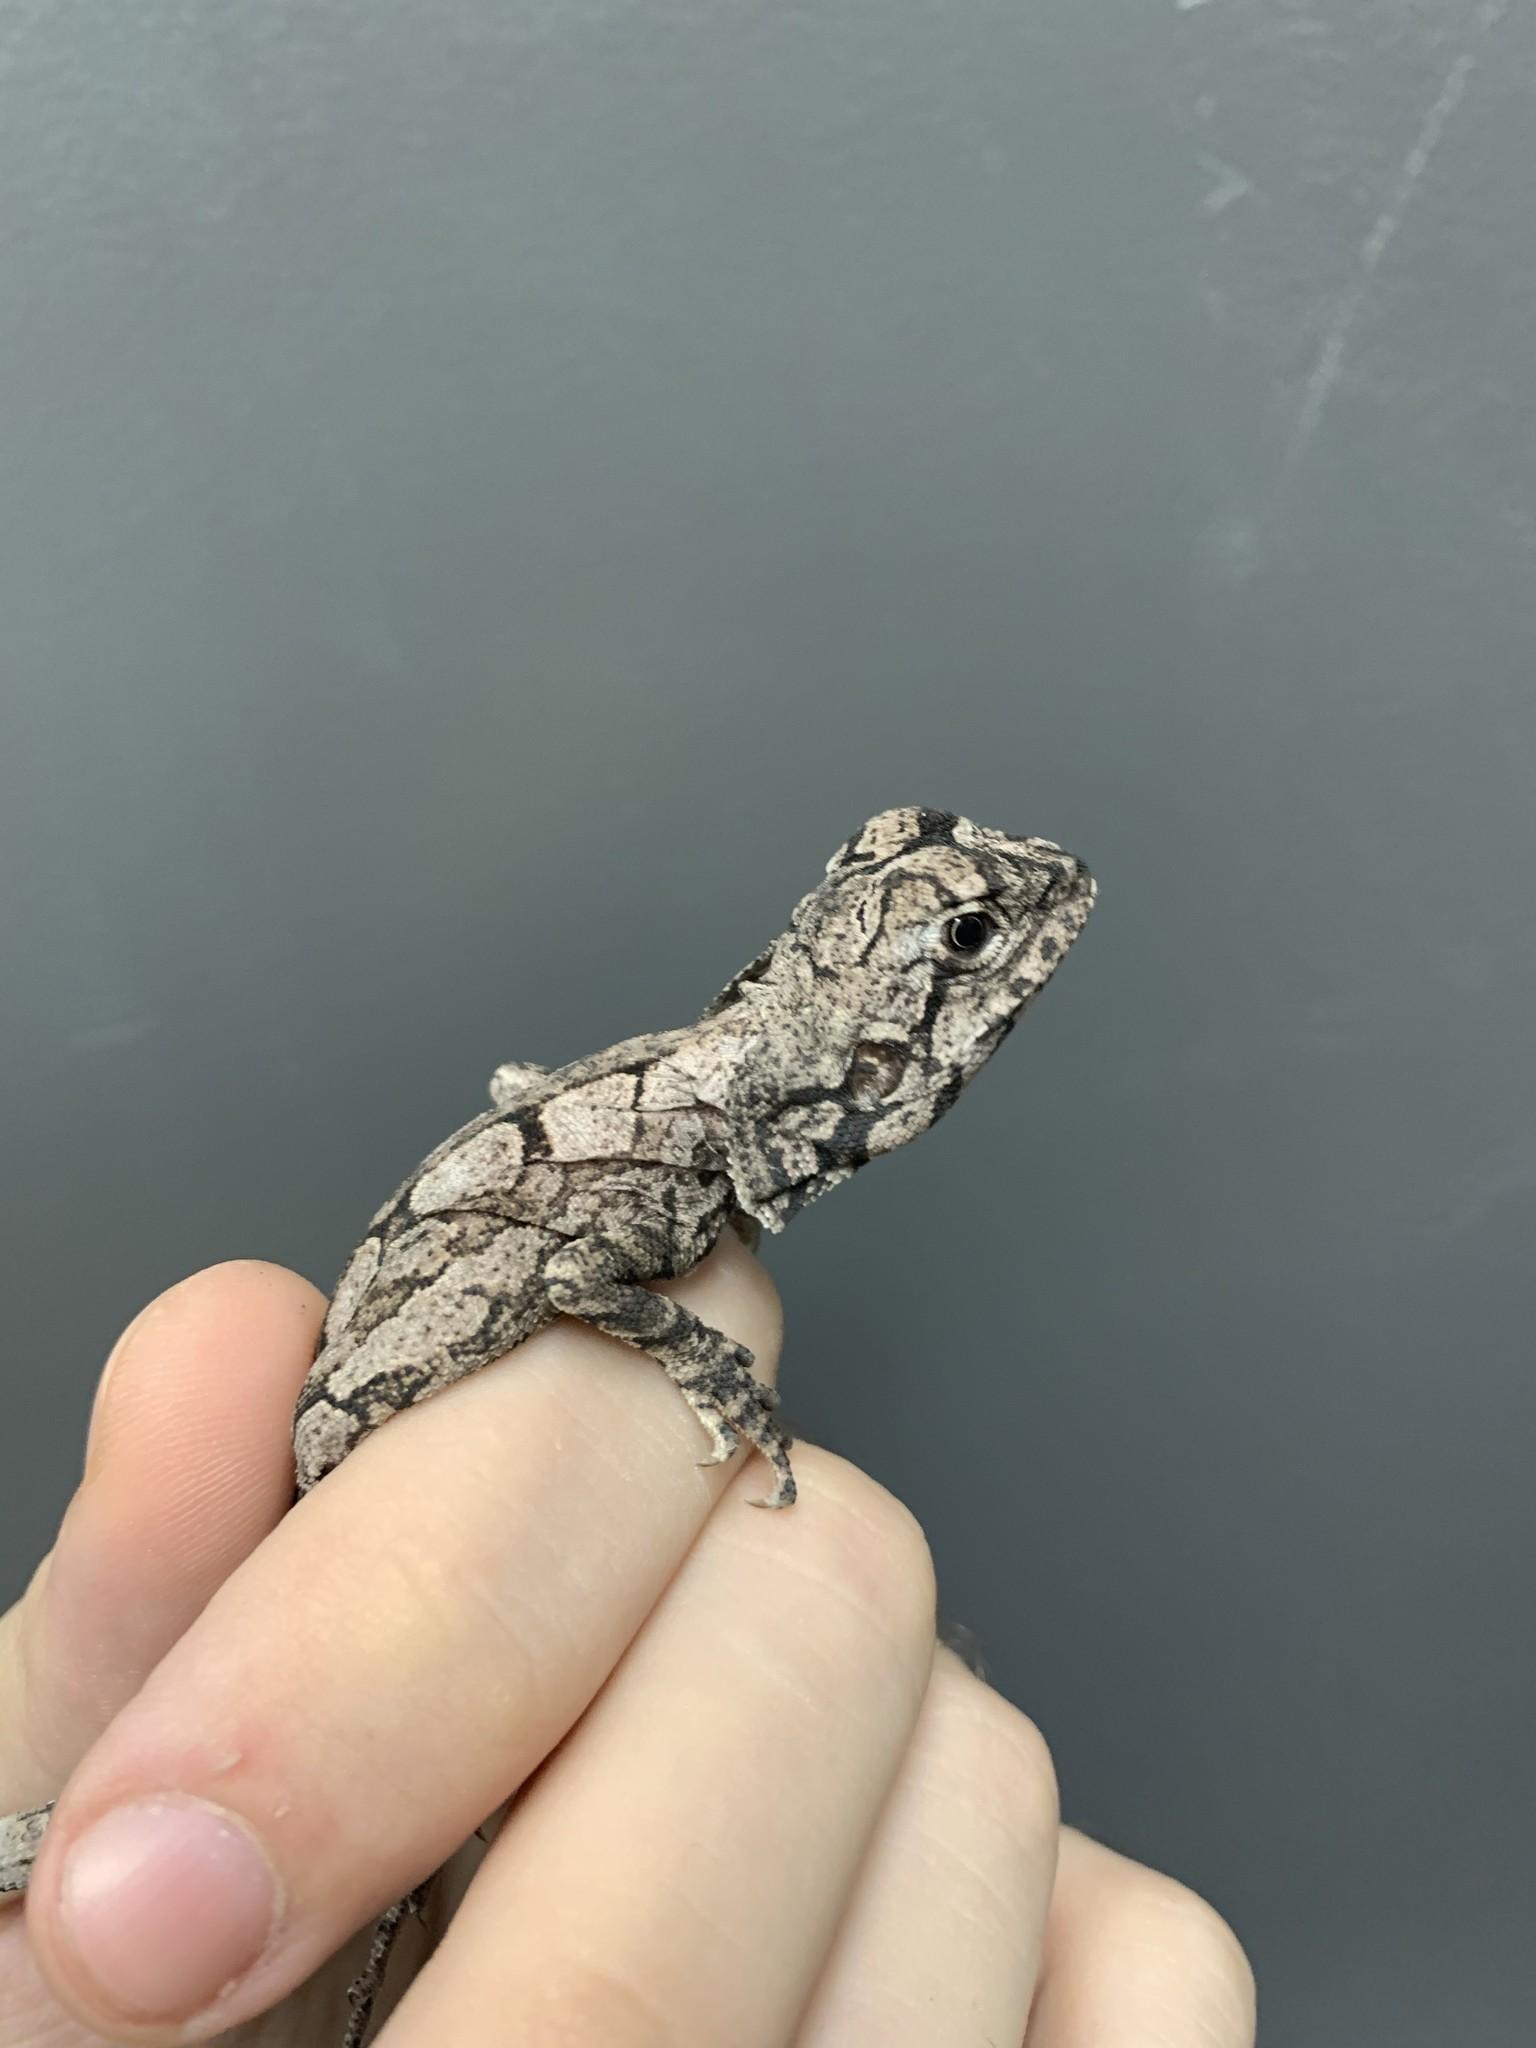 Australian Frilled Dragon